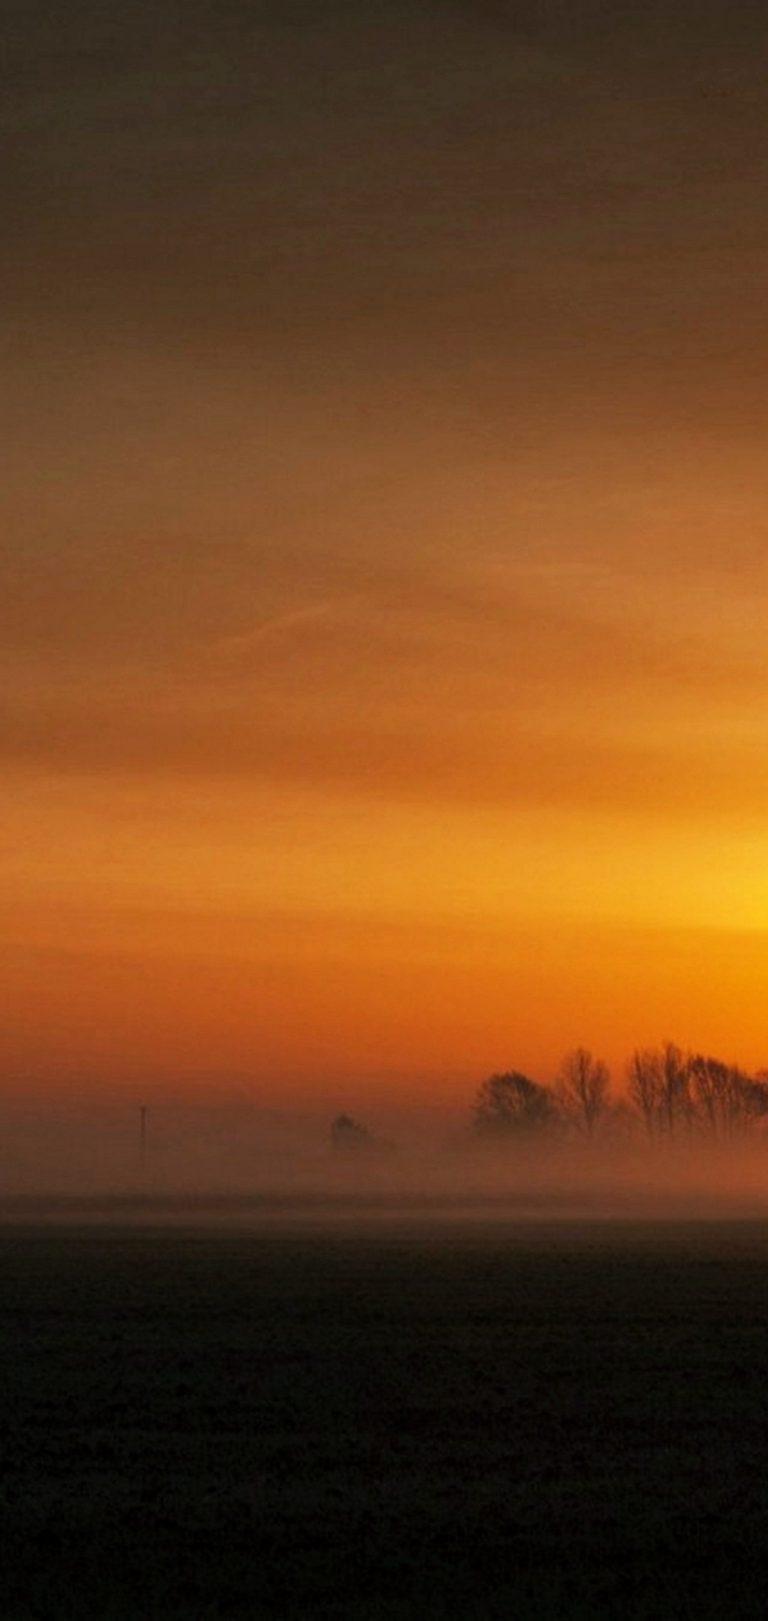 Sunset Landscape Wallpaper 1080x2280 768x1621